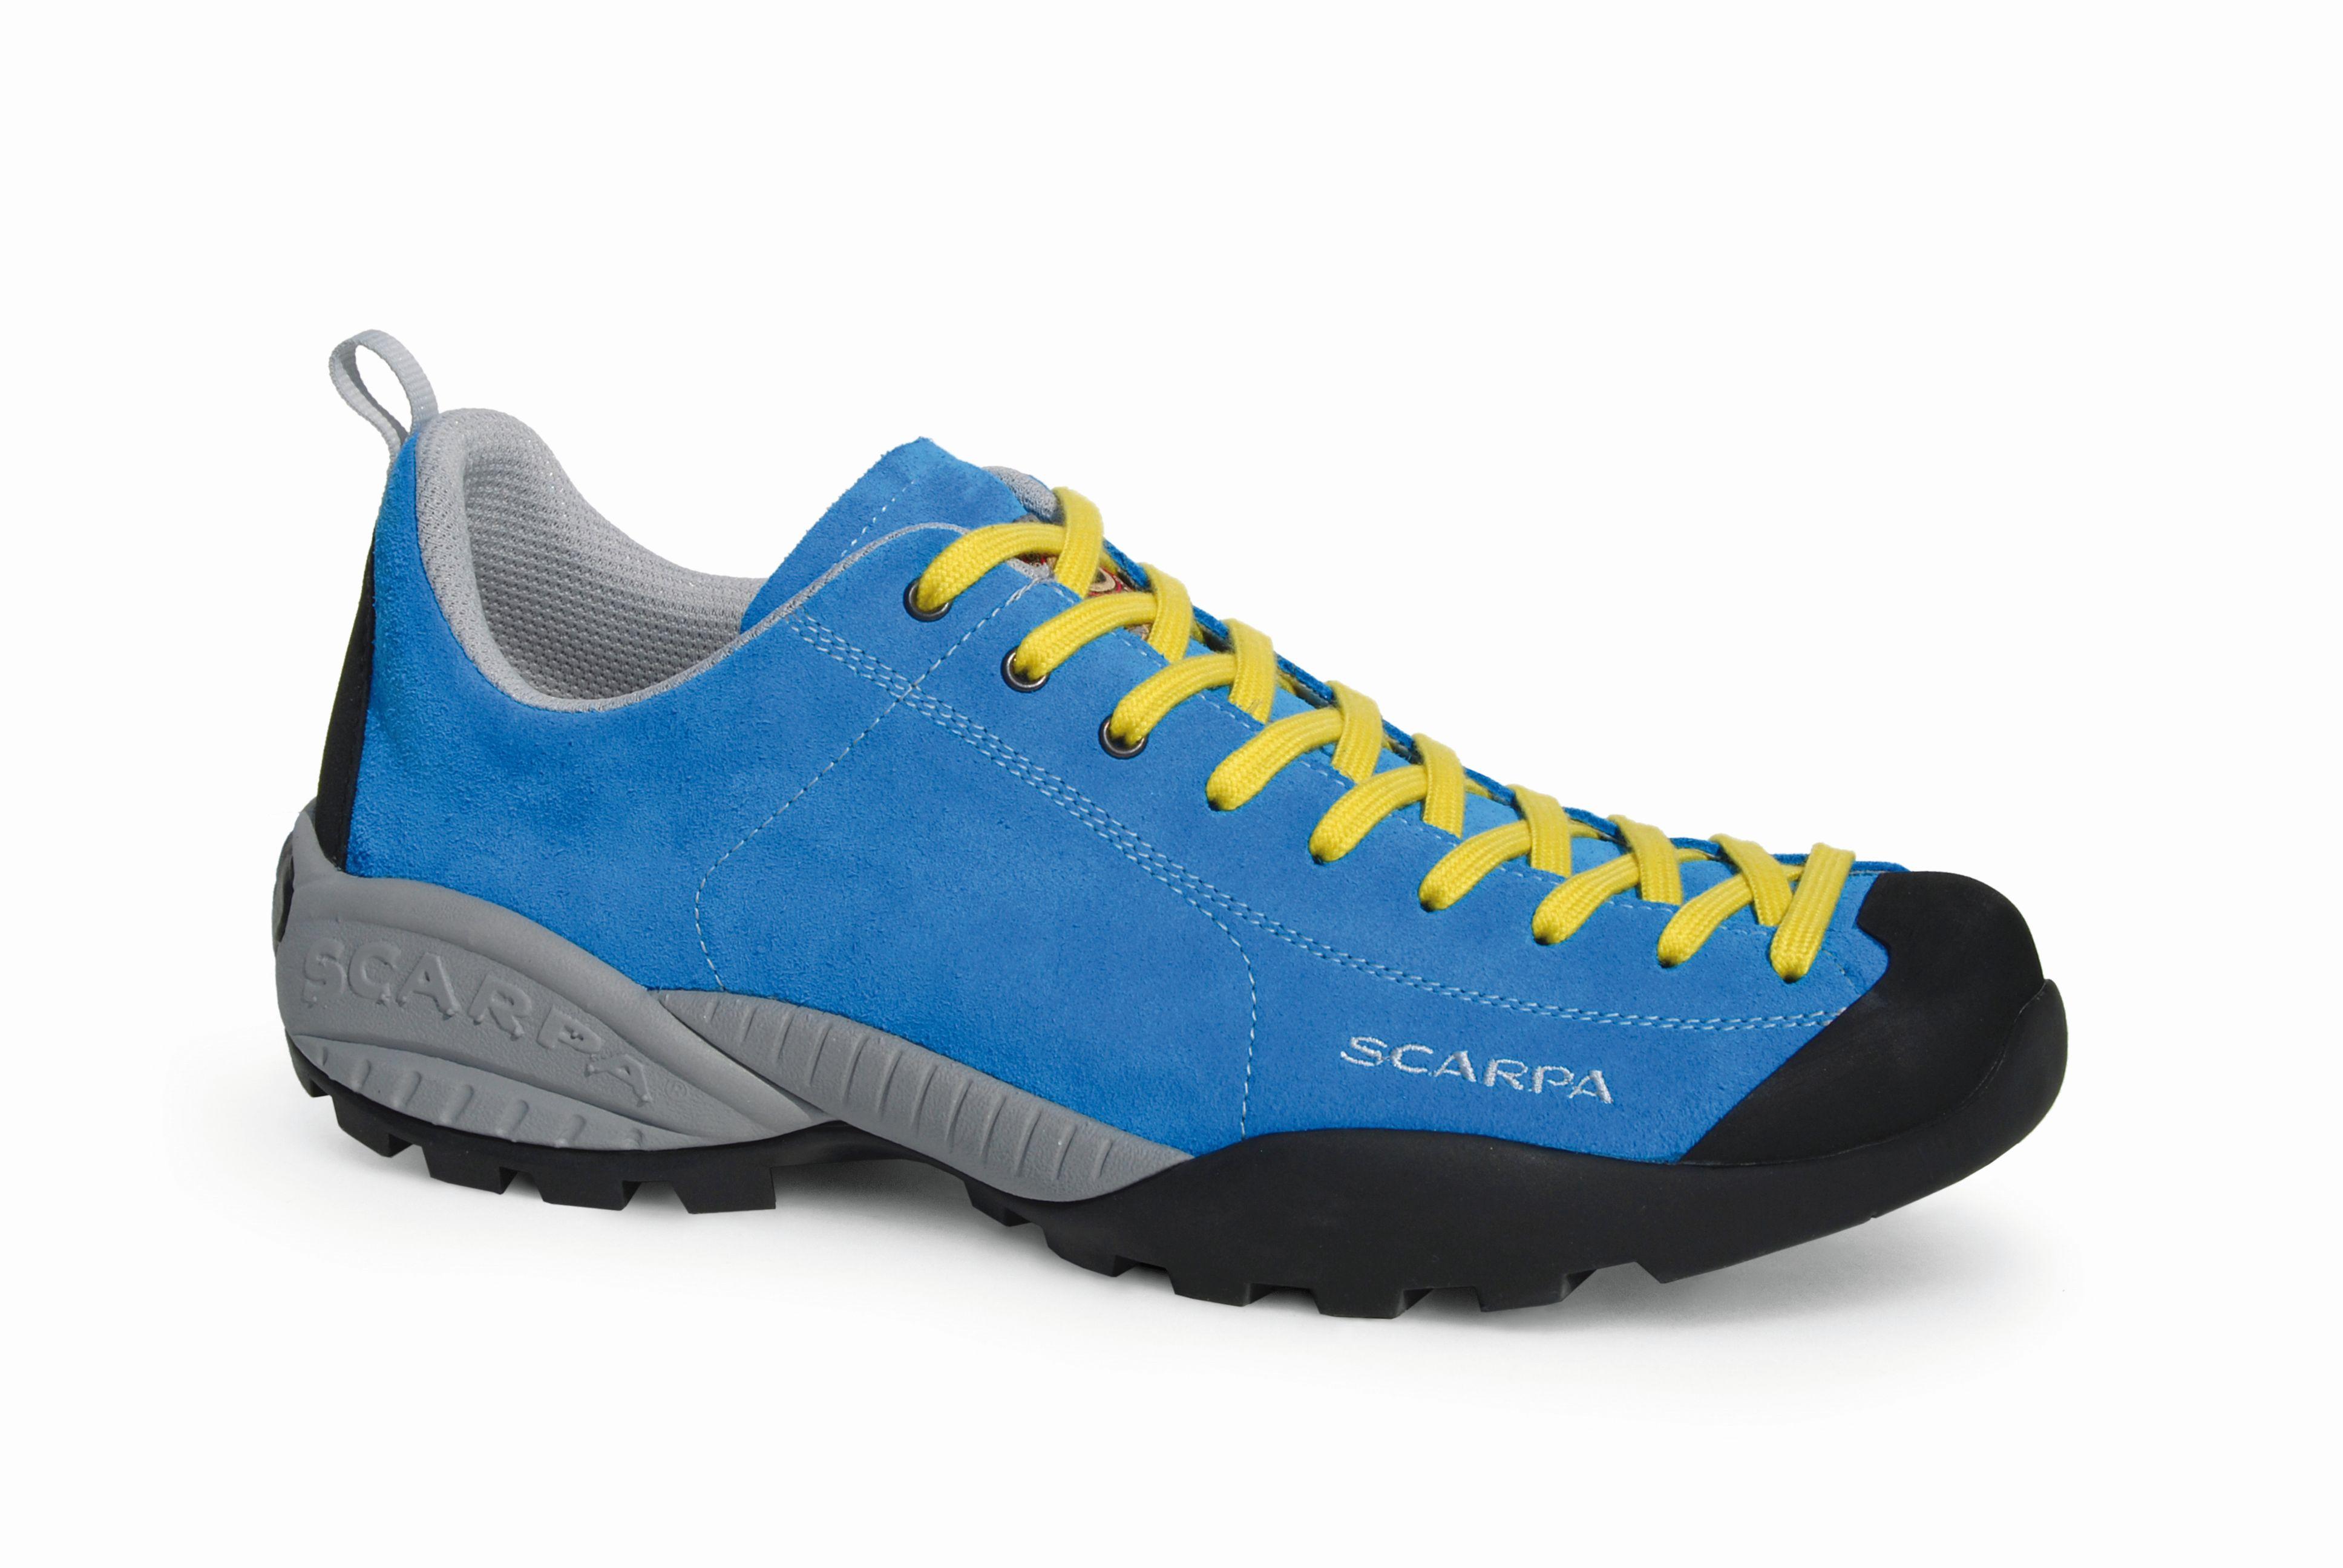 Scarpa Mojito Lt Vivid blue/Yellow-30